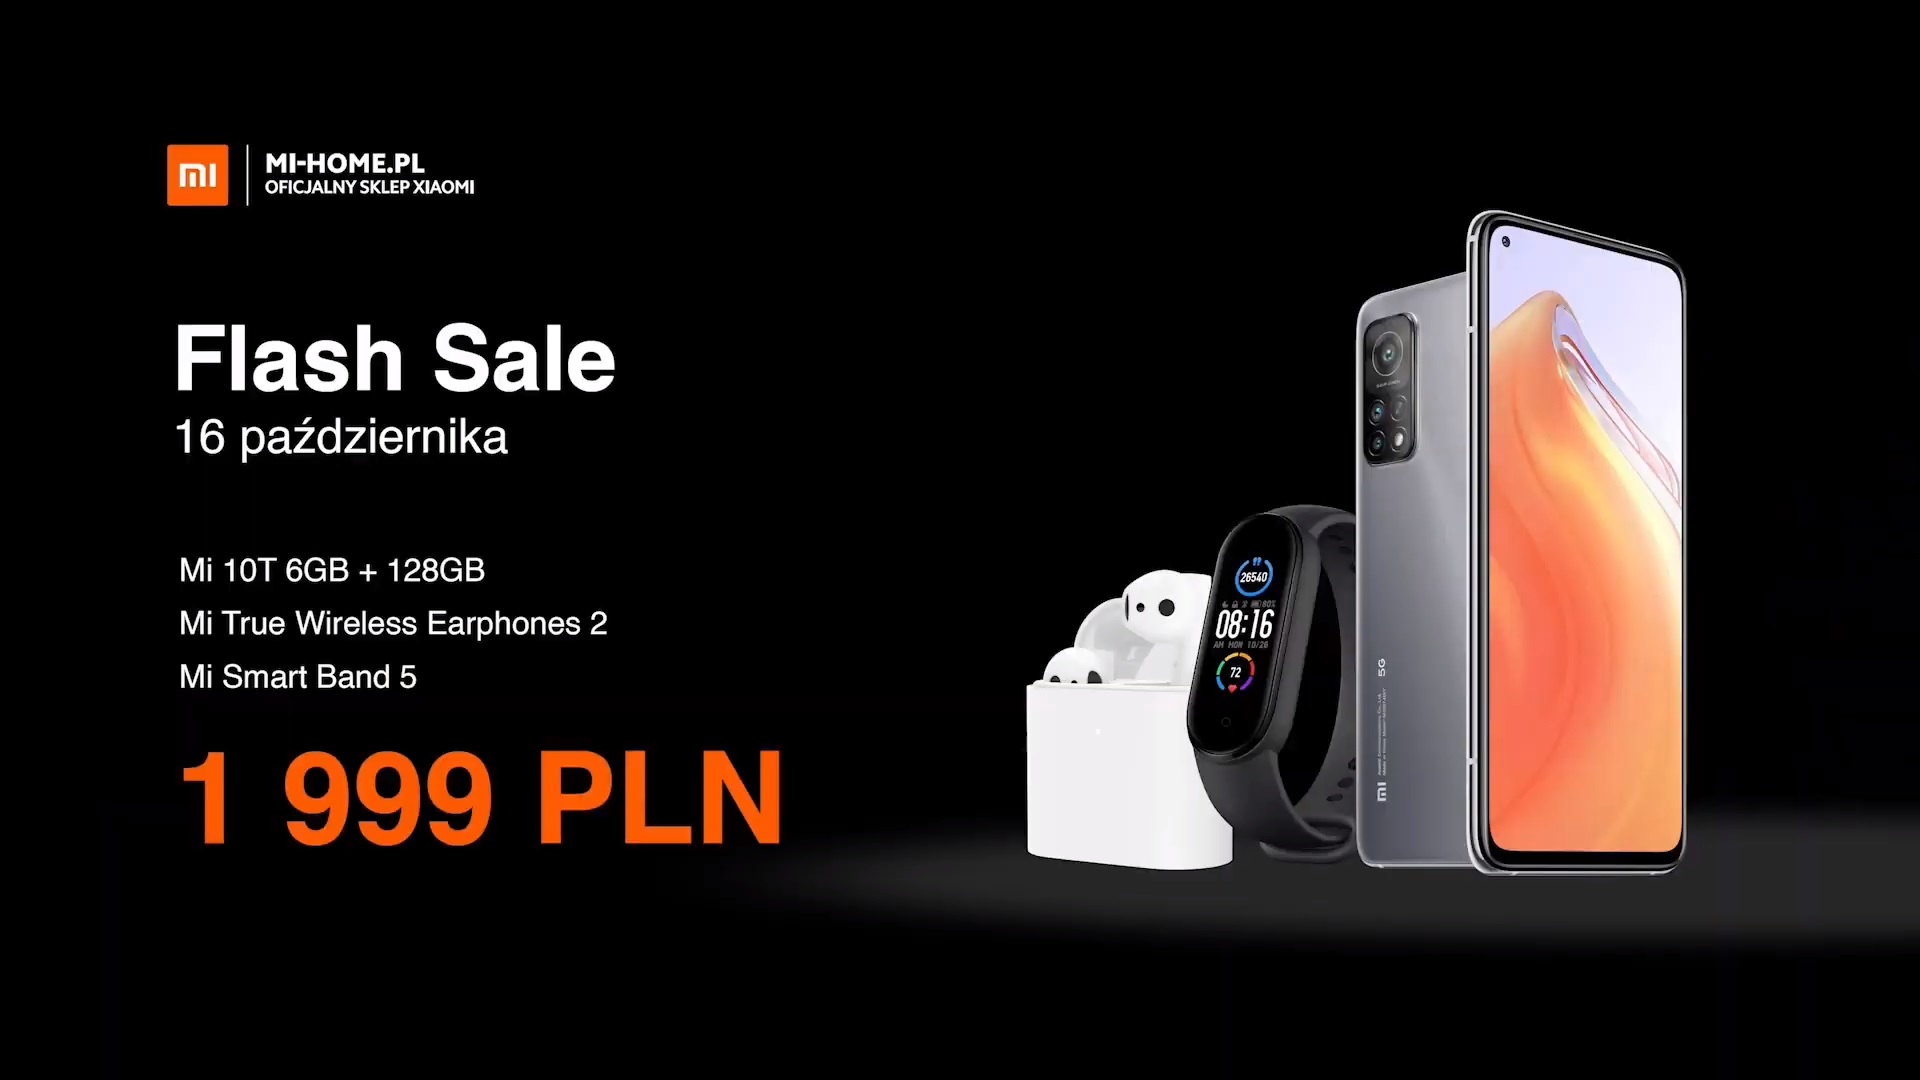 smartfon Xiaomi Mi 10T samrtphone Flash Sale